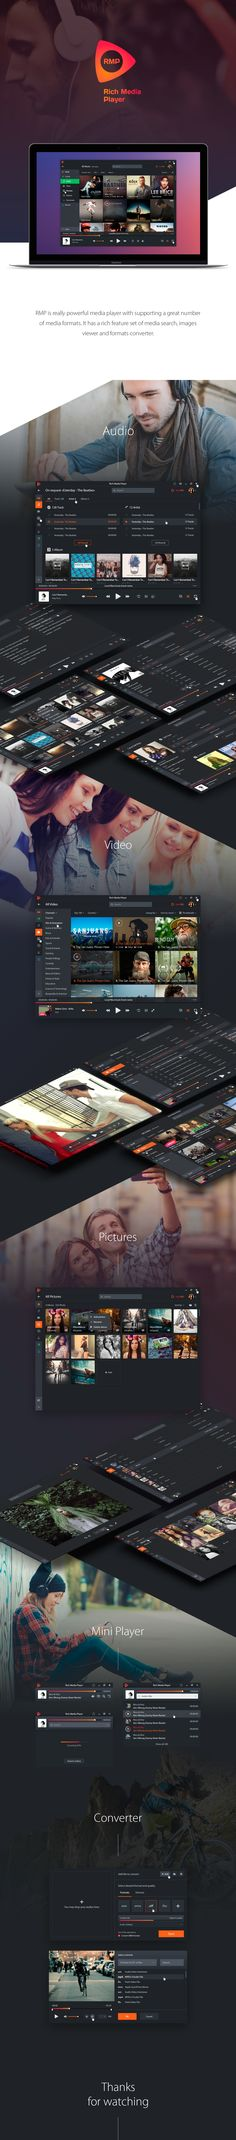 Rich Media Player on Behance